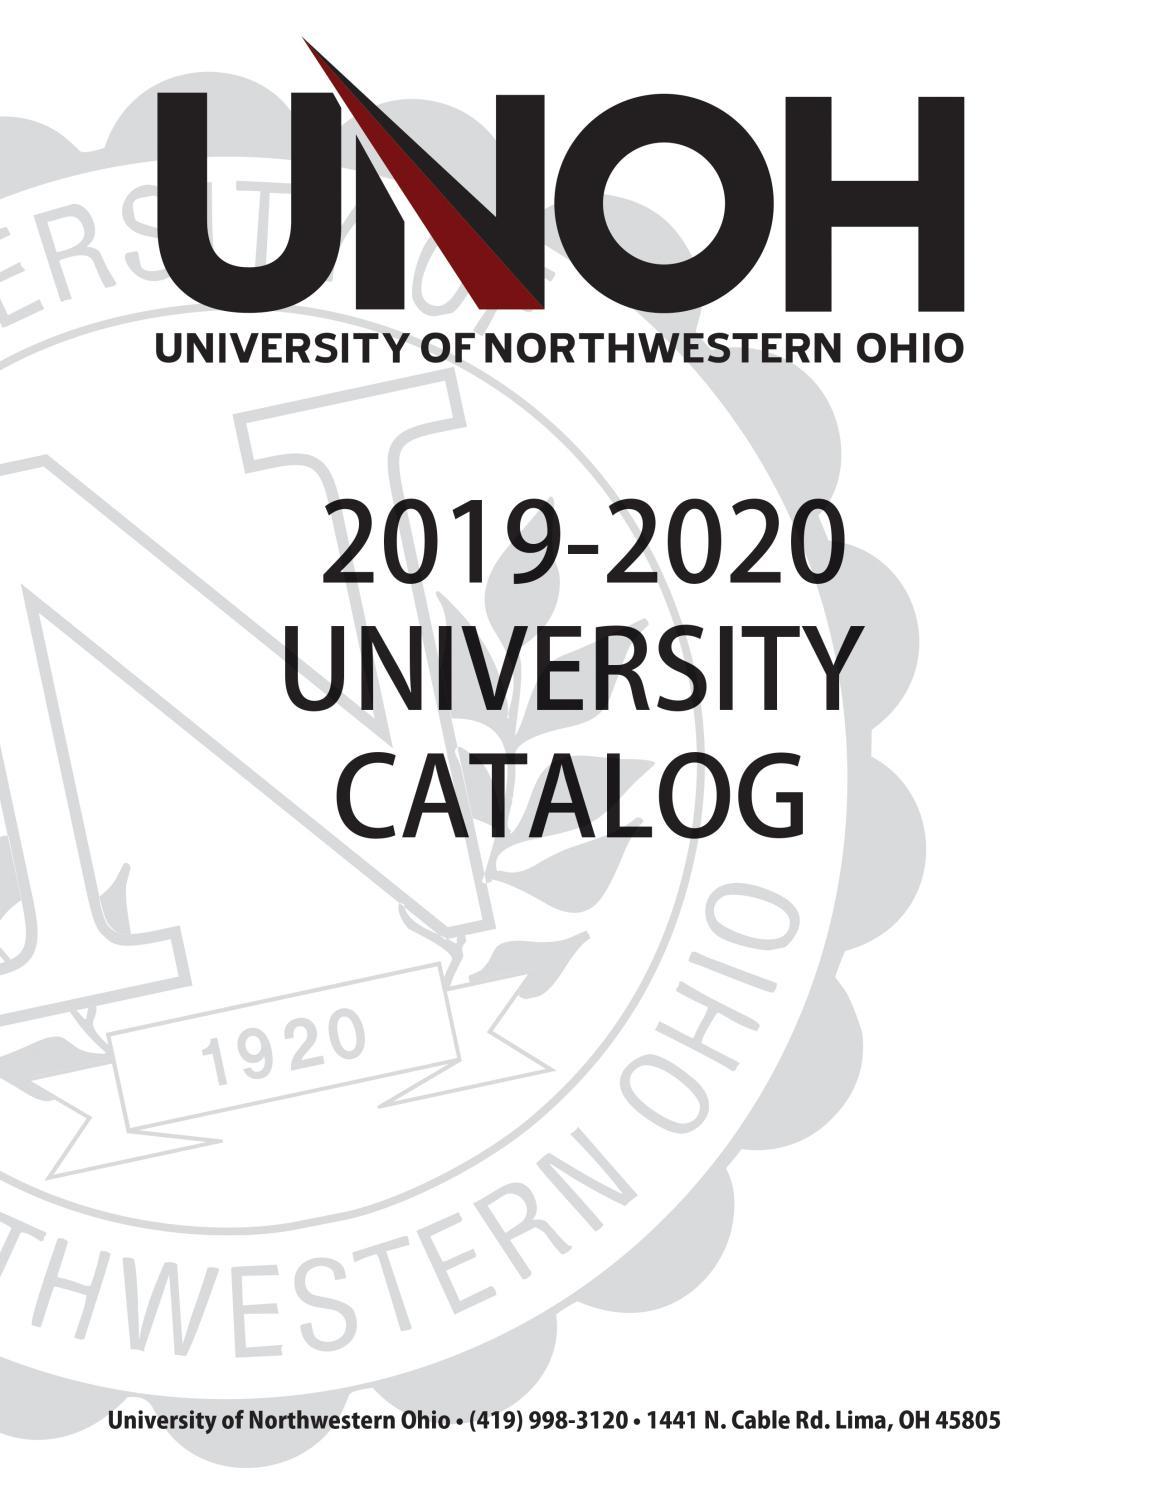 unoh_catalog by UNOH - issuu